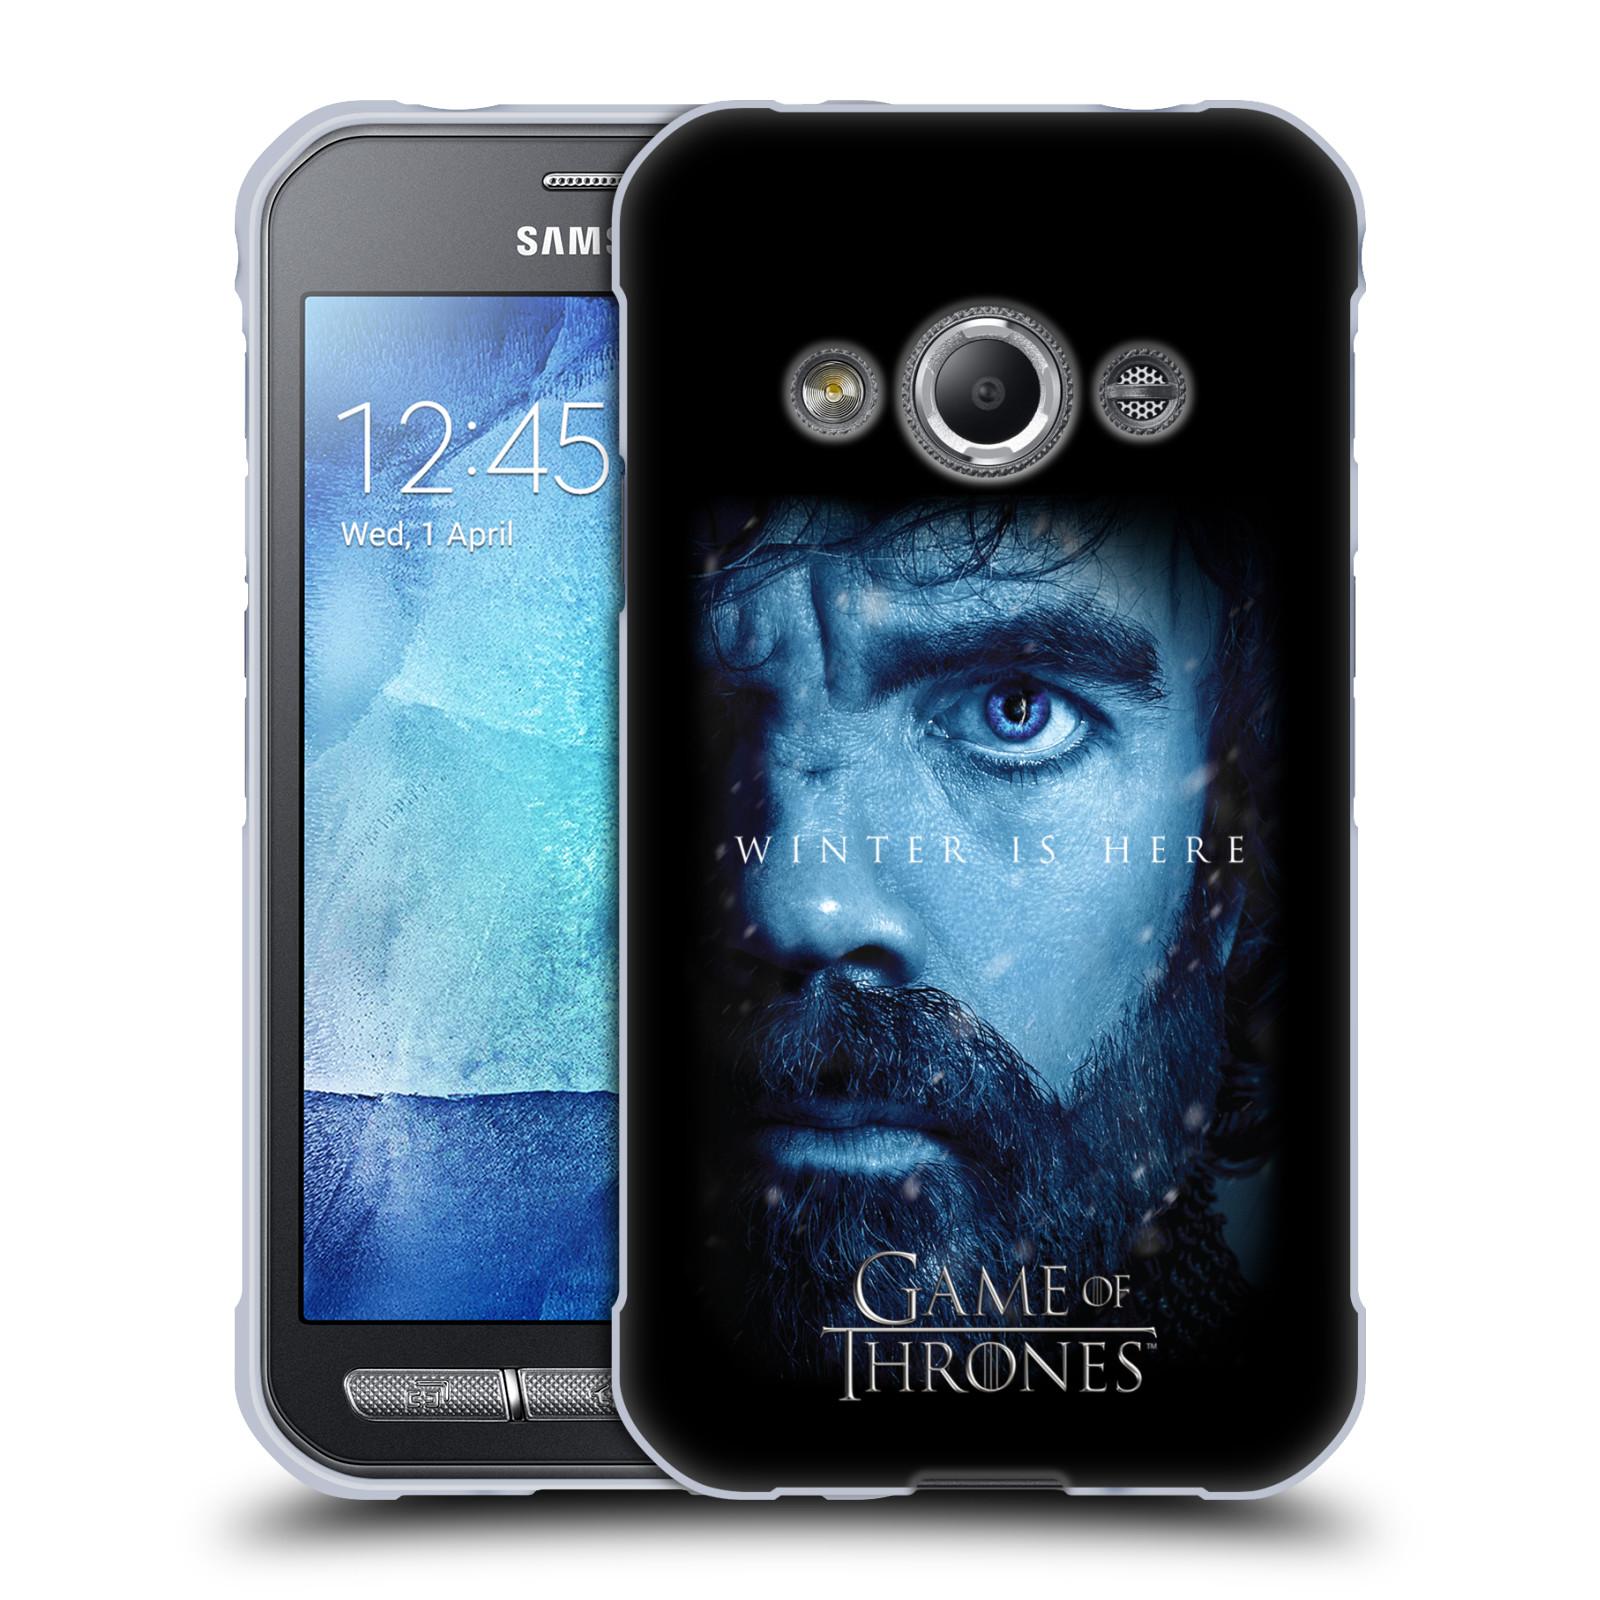 Silikonové pouzdro na mobil Samsung Galaxy Xcover 3 - Head Case - Hra o trůny - Tyrion Lannister - Winter is here (Silikonový kryt či obal na mobilní telefon s motivem Game of Thrones - Tyrion Lannister - Winter is here - Season 7 pro Samsung Galaxy Xcove